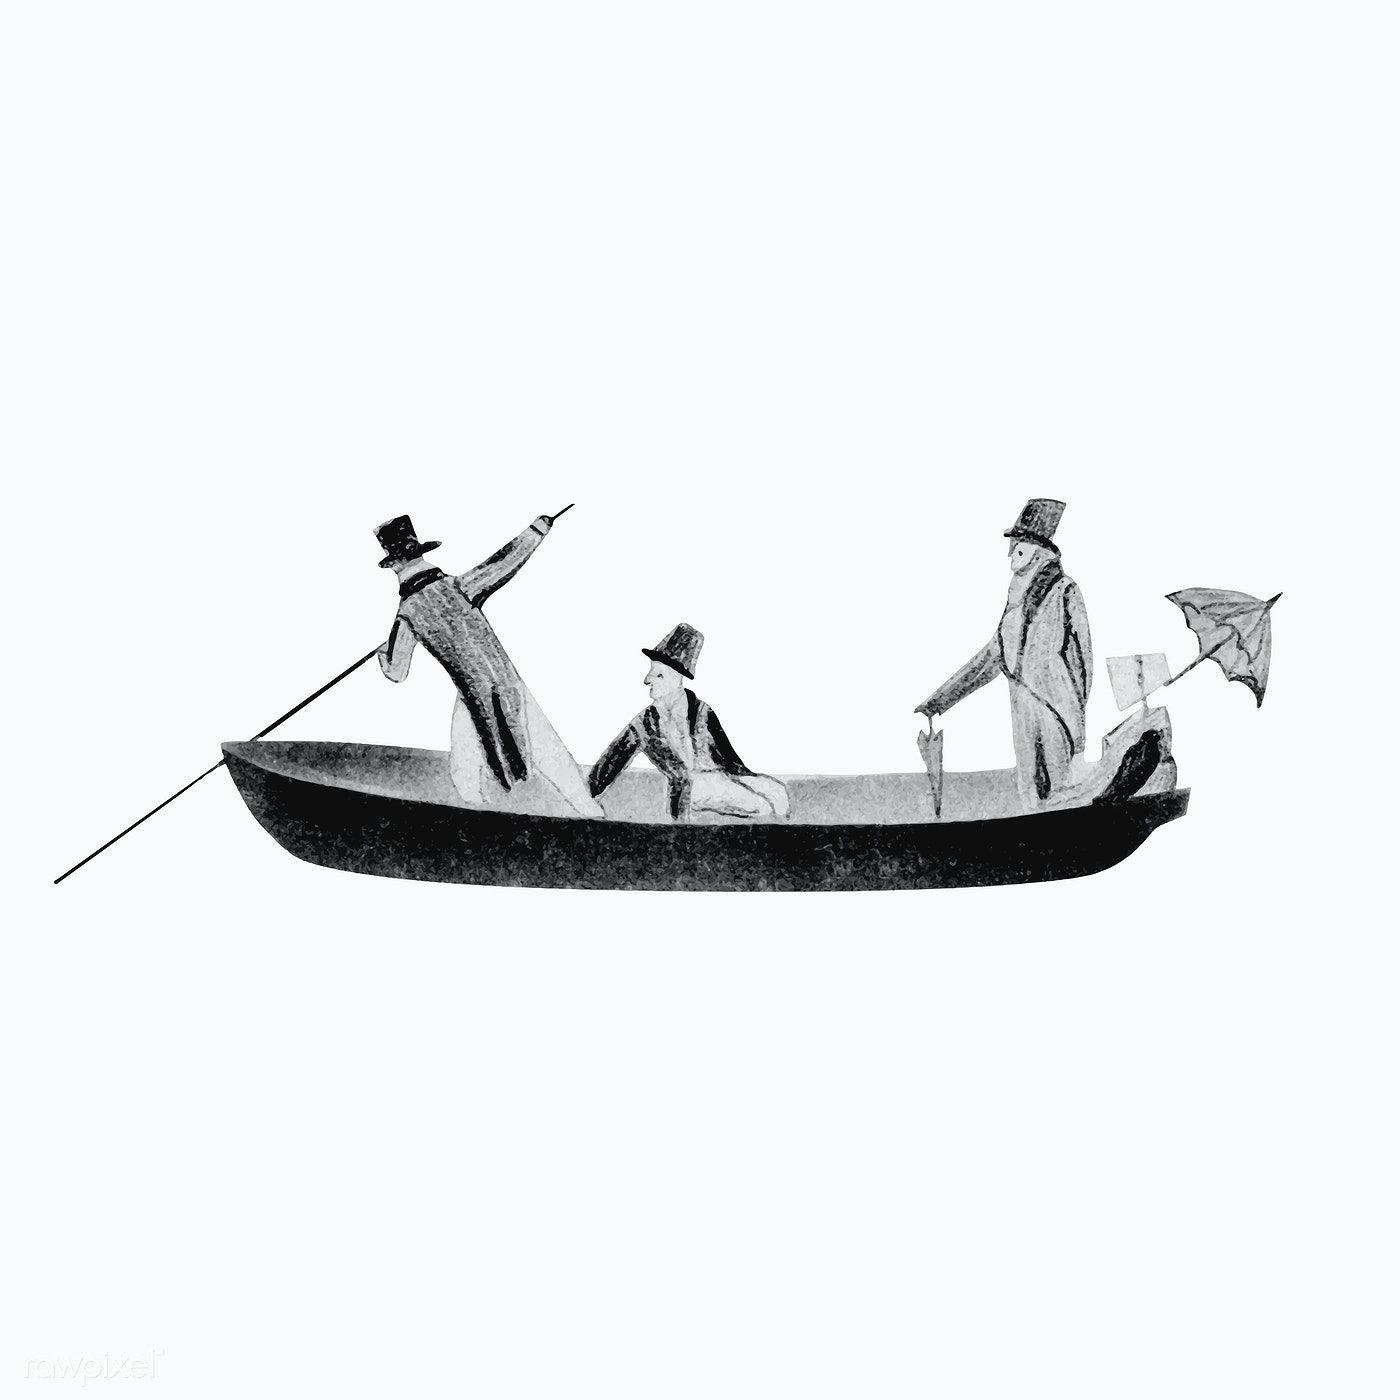 Download Premium Vector Of Victorian Men In Rowing Boat Vintage Vintage Illustration Boat Illustration Boat Icon